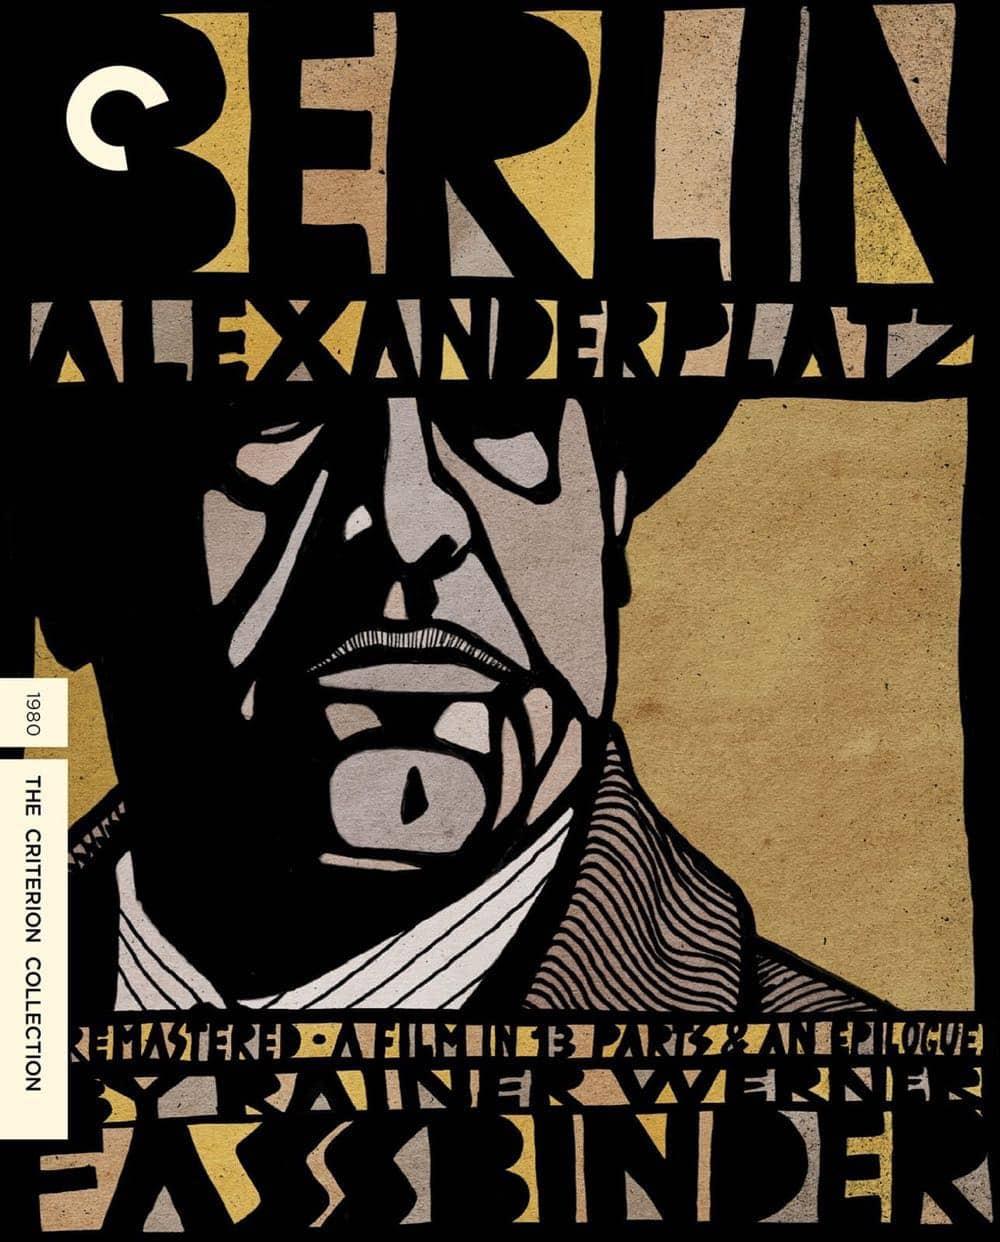 Berlin Alexanderplatz The Criterion Collection